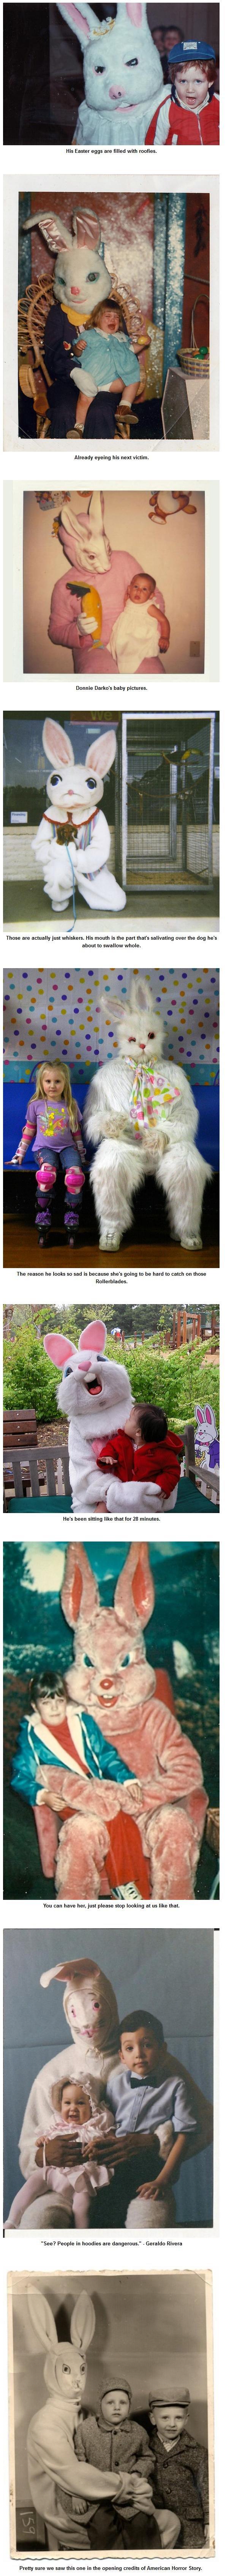 Happy Easter #4. .. mfw donnie darko Happy Easter #4 mfw donnie darko